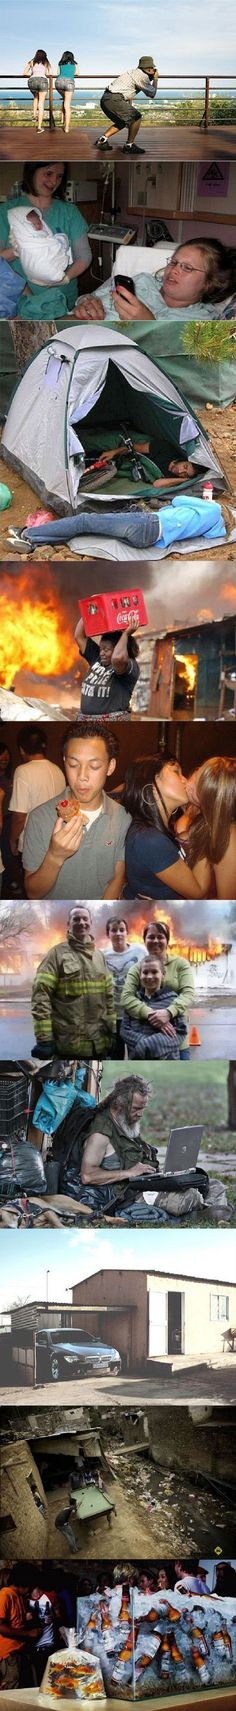 Get your priorities straight...